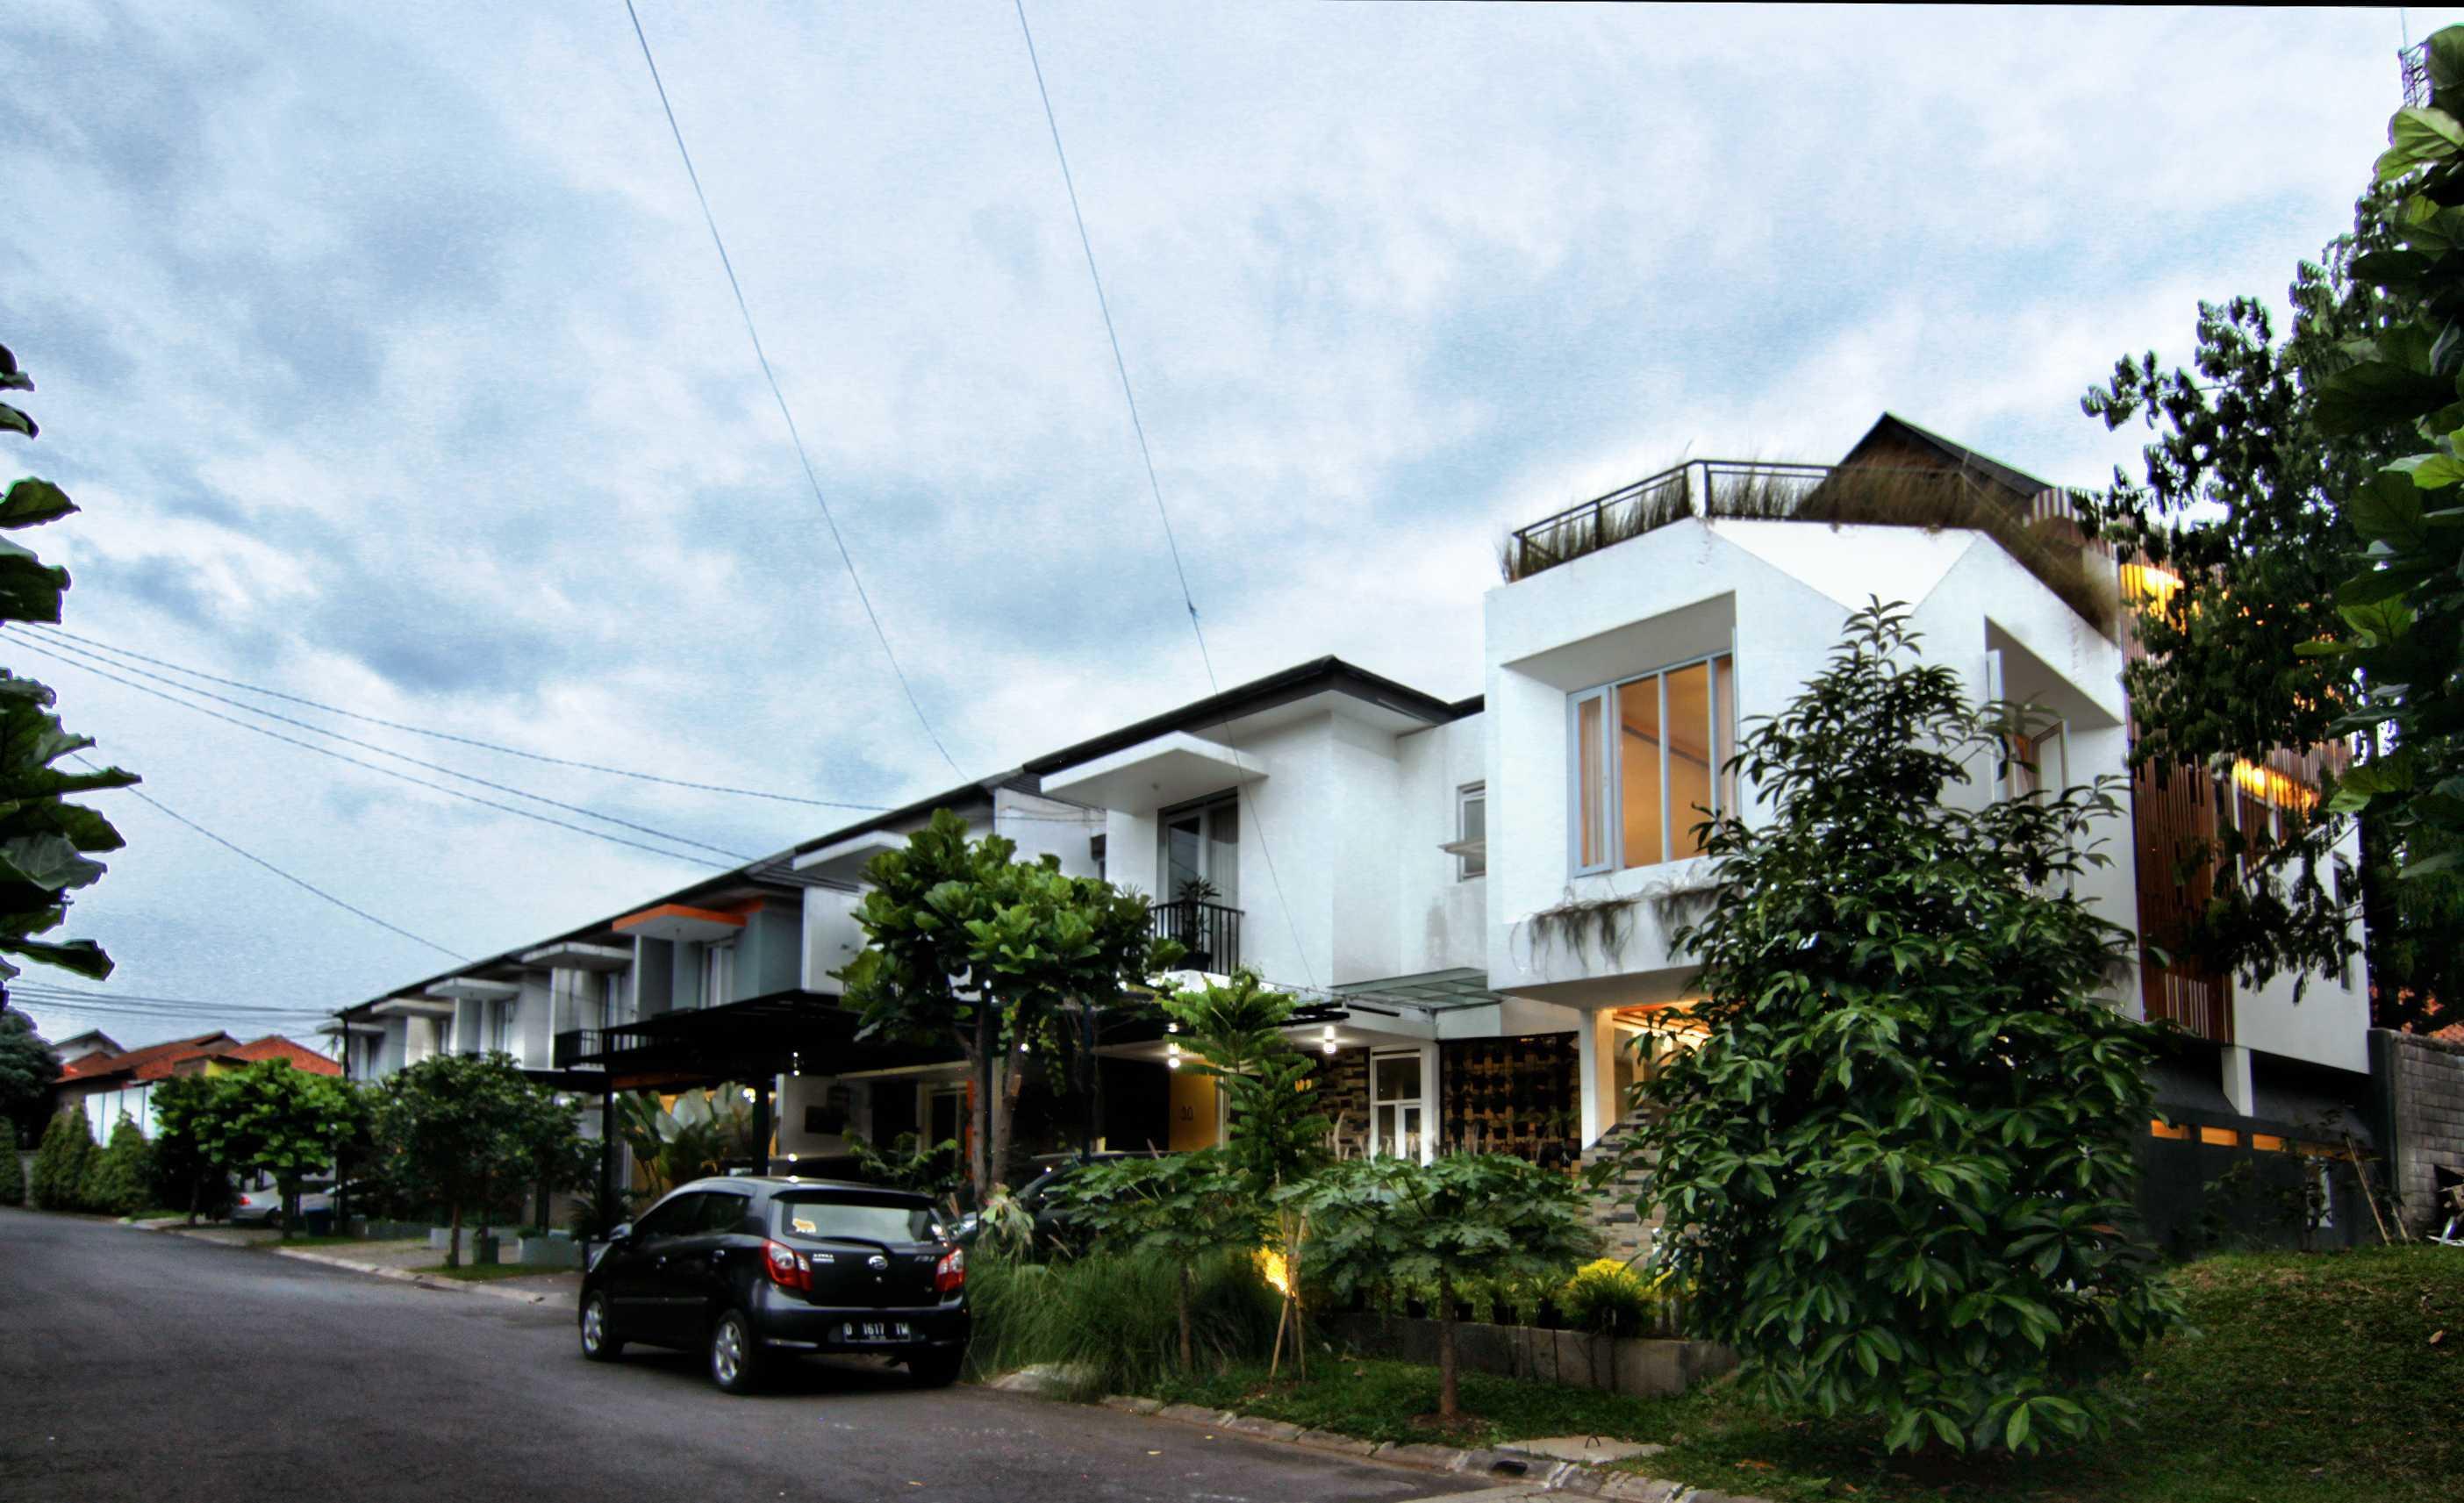 Mineli Architects Al House Baros, Cimahi Tengah, Kota Cimahi, Jawa Barat, Indonesia Baros, Cimahi Tengah, Kota Cimahi, Jawa Barat, Indonesia Exterior View Contemporary <P>Eksterior</p> 45263